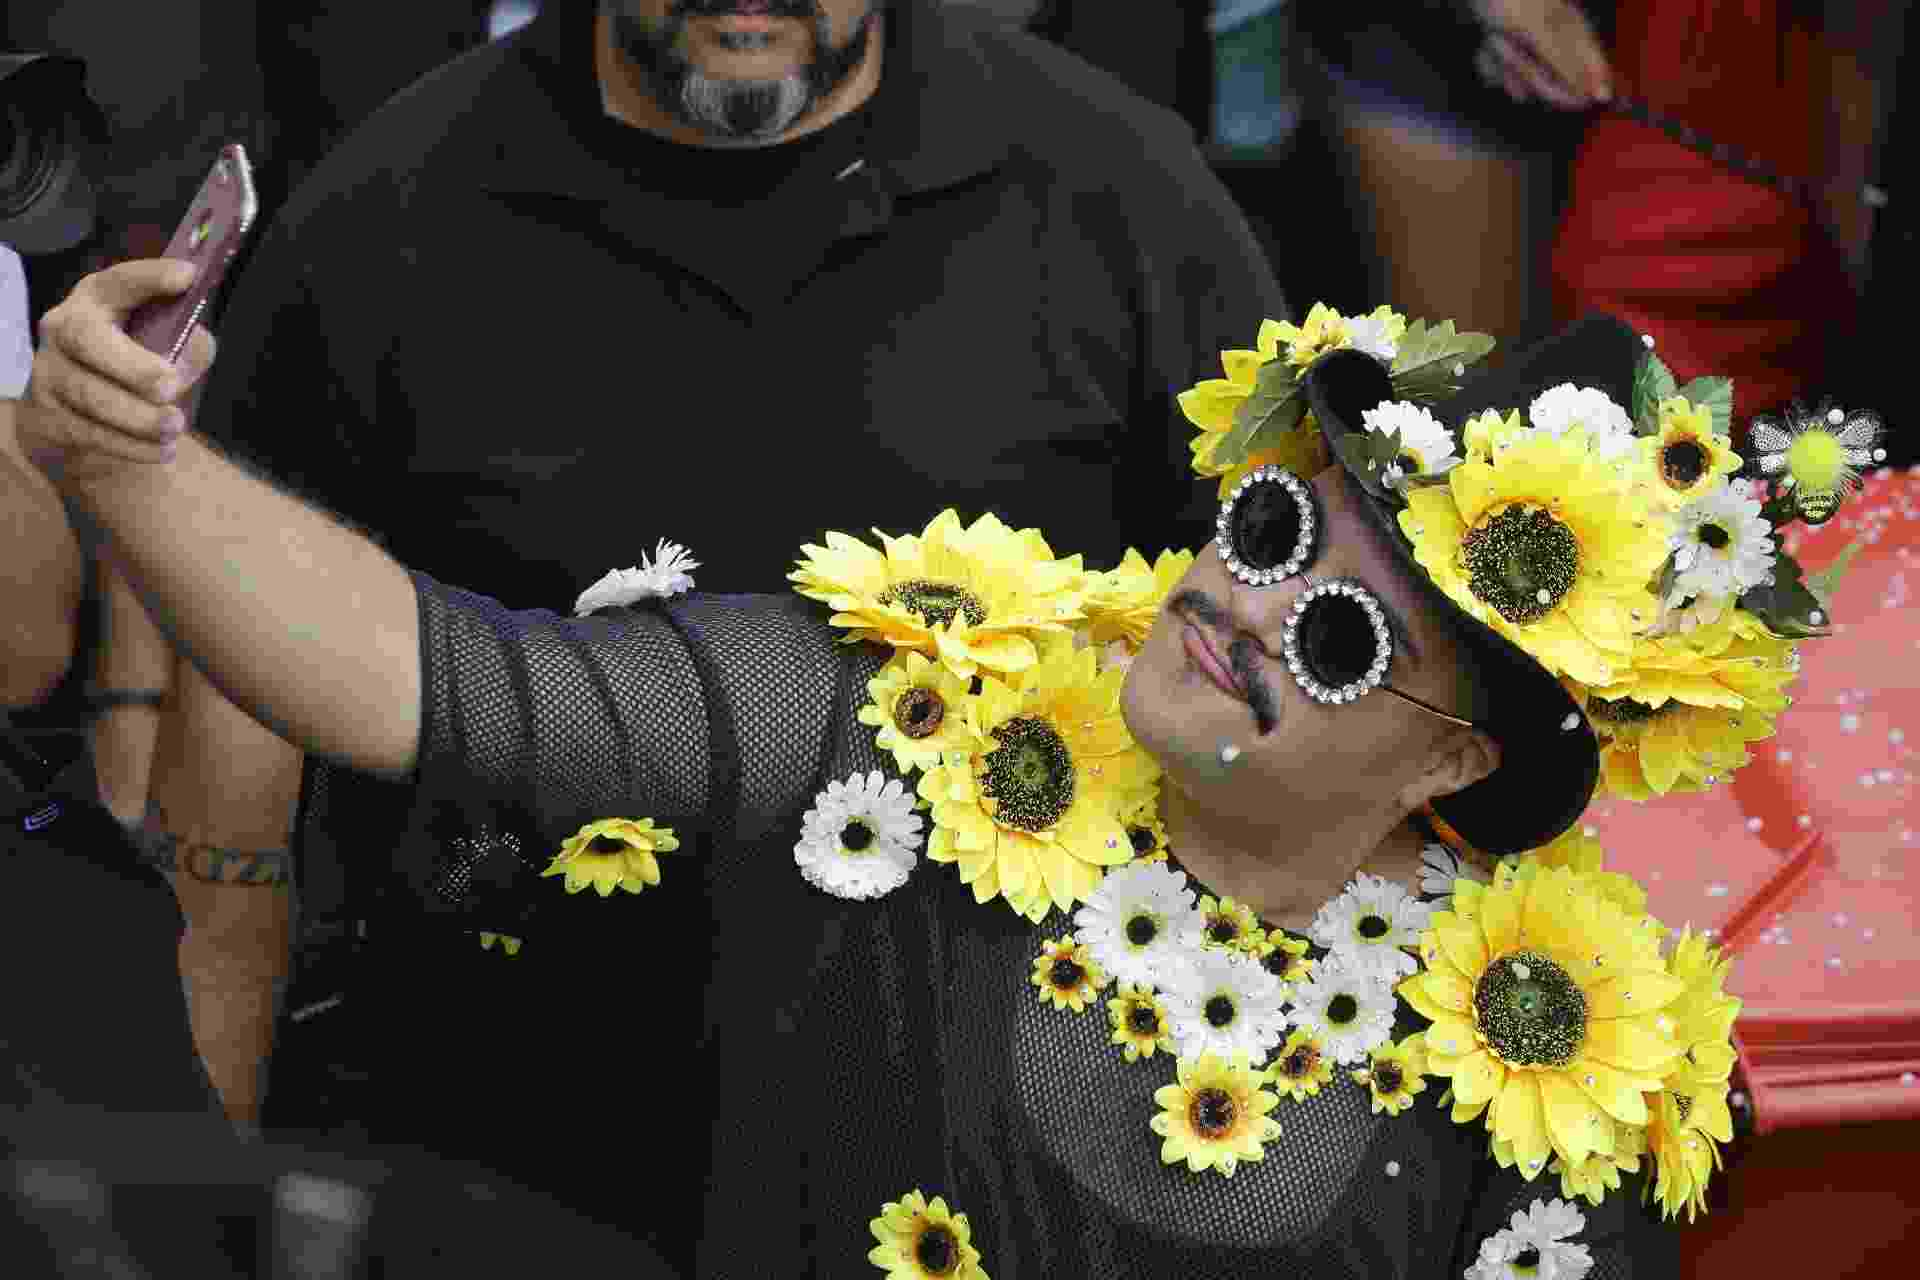 Tiago Abravanel faz Carnaval com Bloco Gambiarra na zona sul de São Paulo - Nelson Antoine/UOL